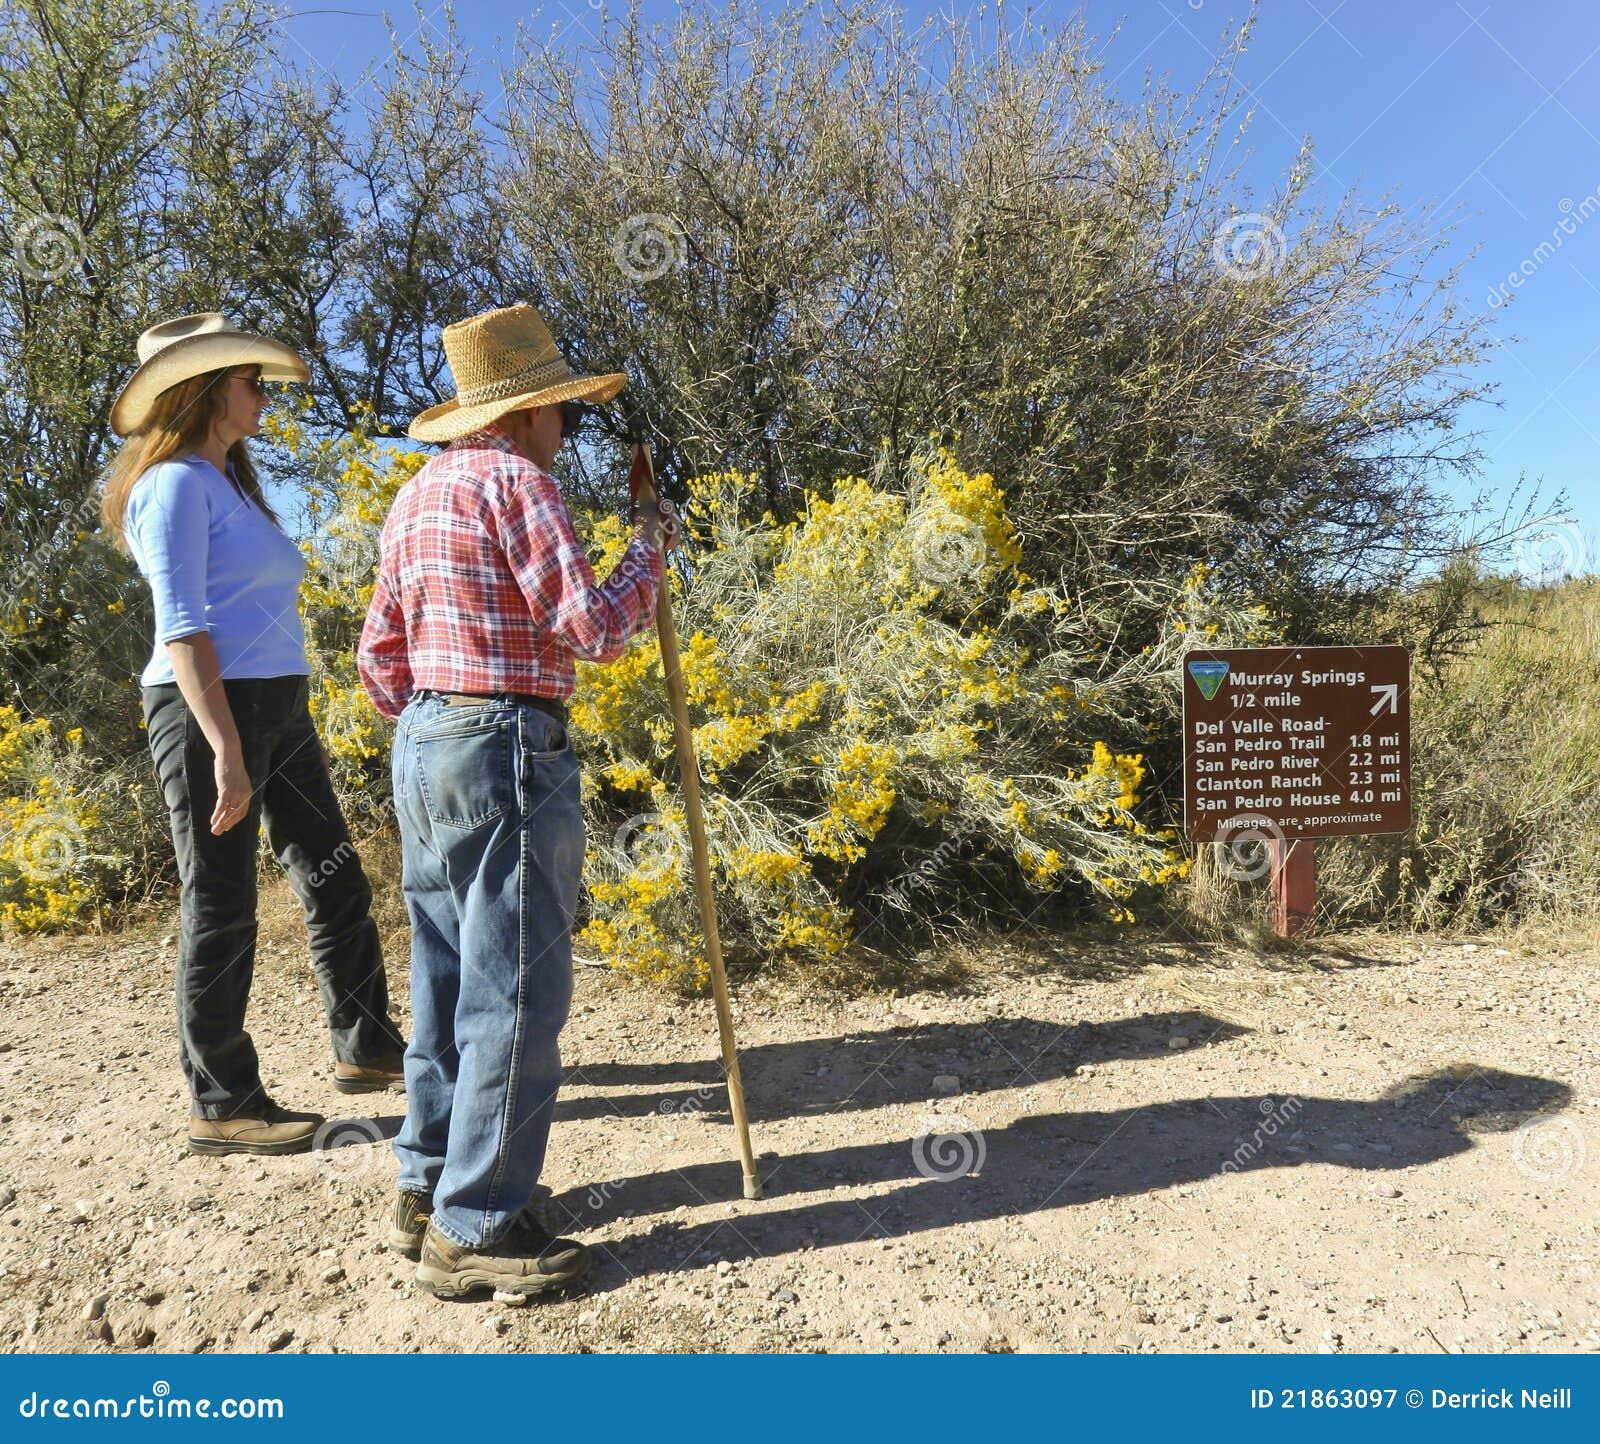 Clovis hiking тропка весен пар murray